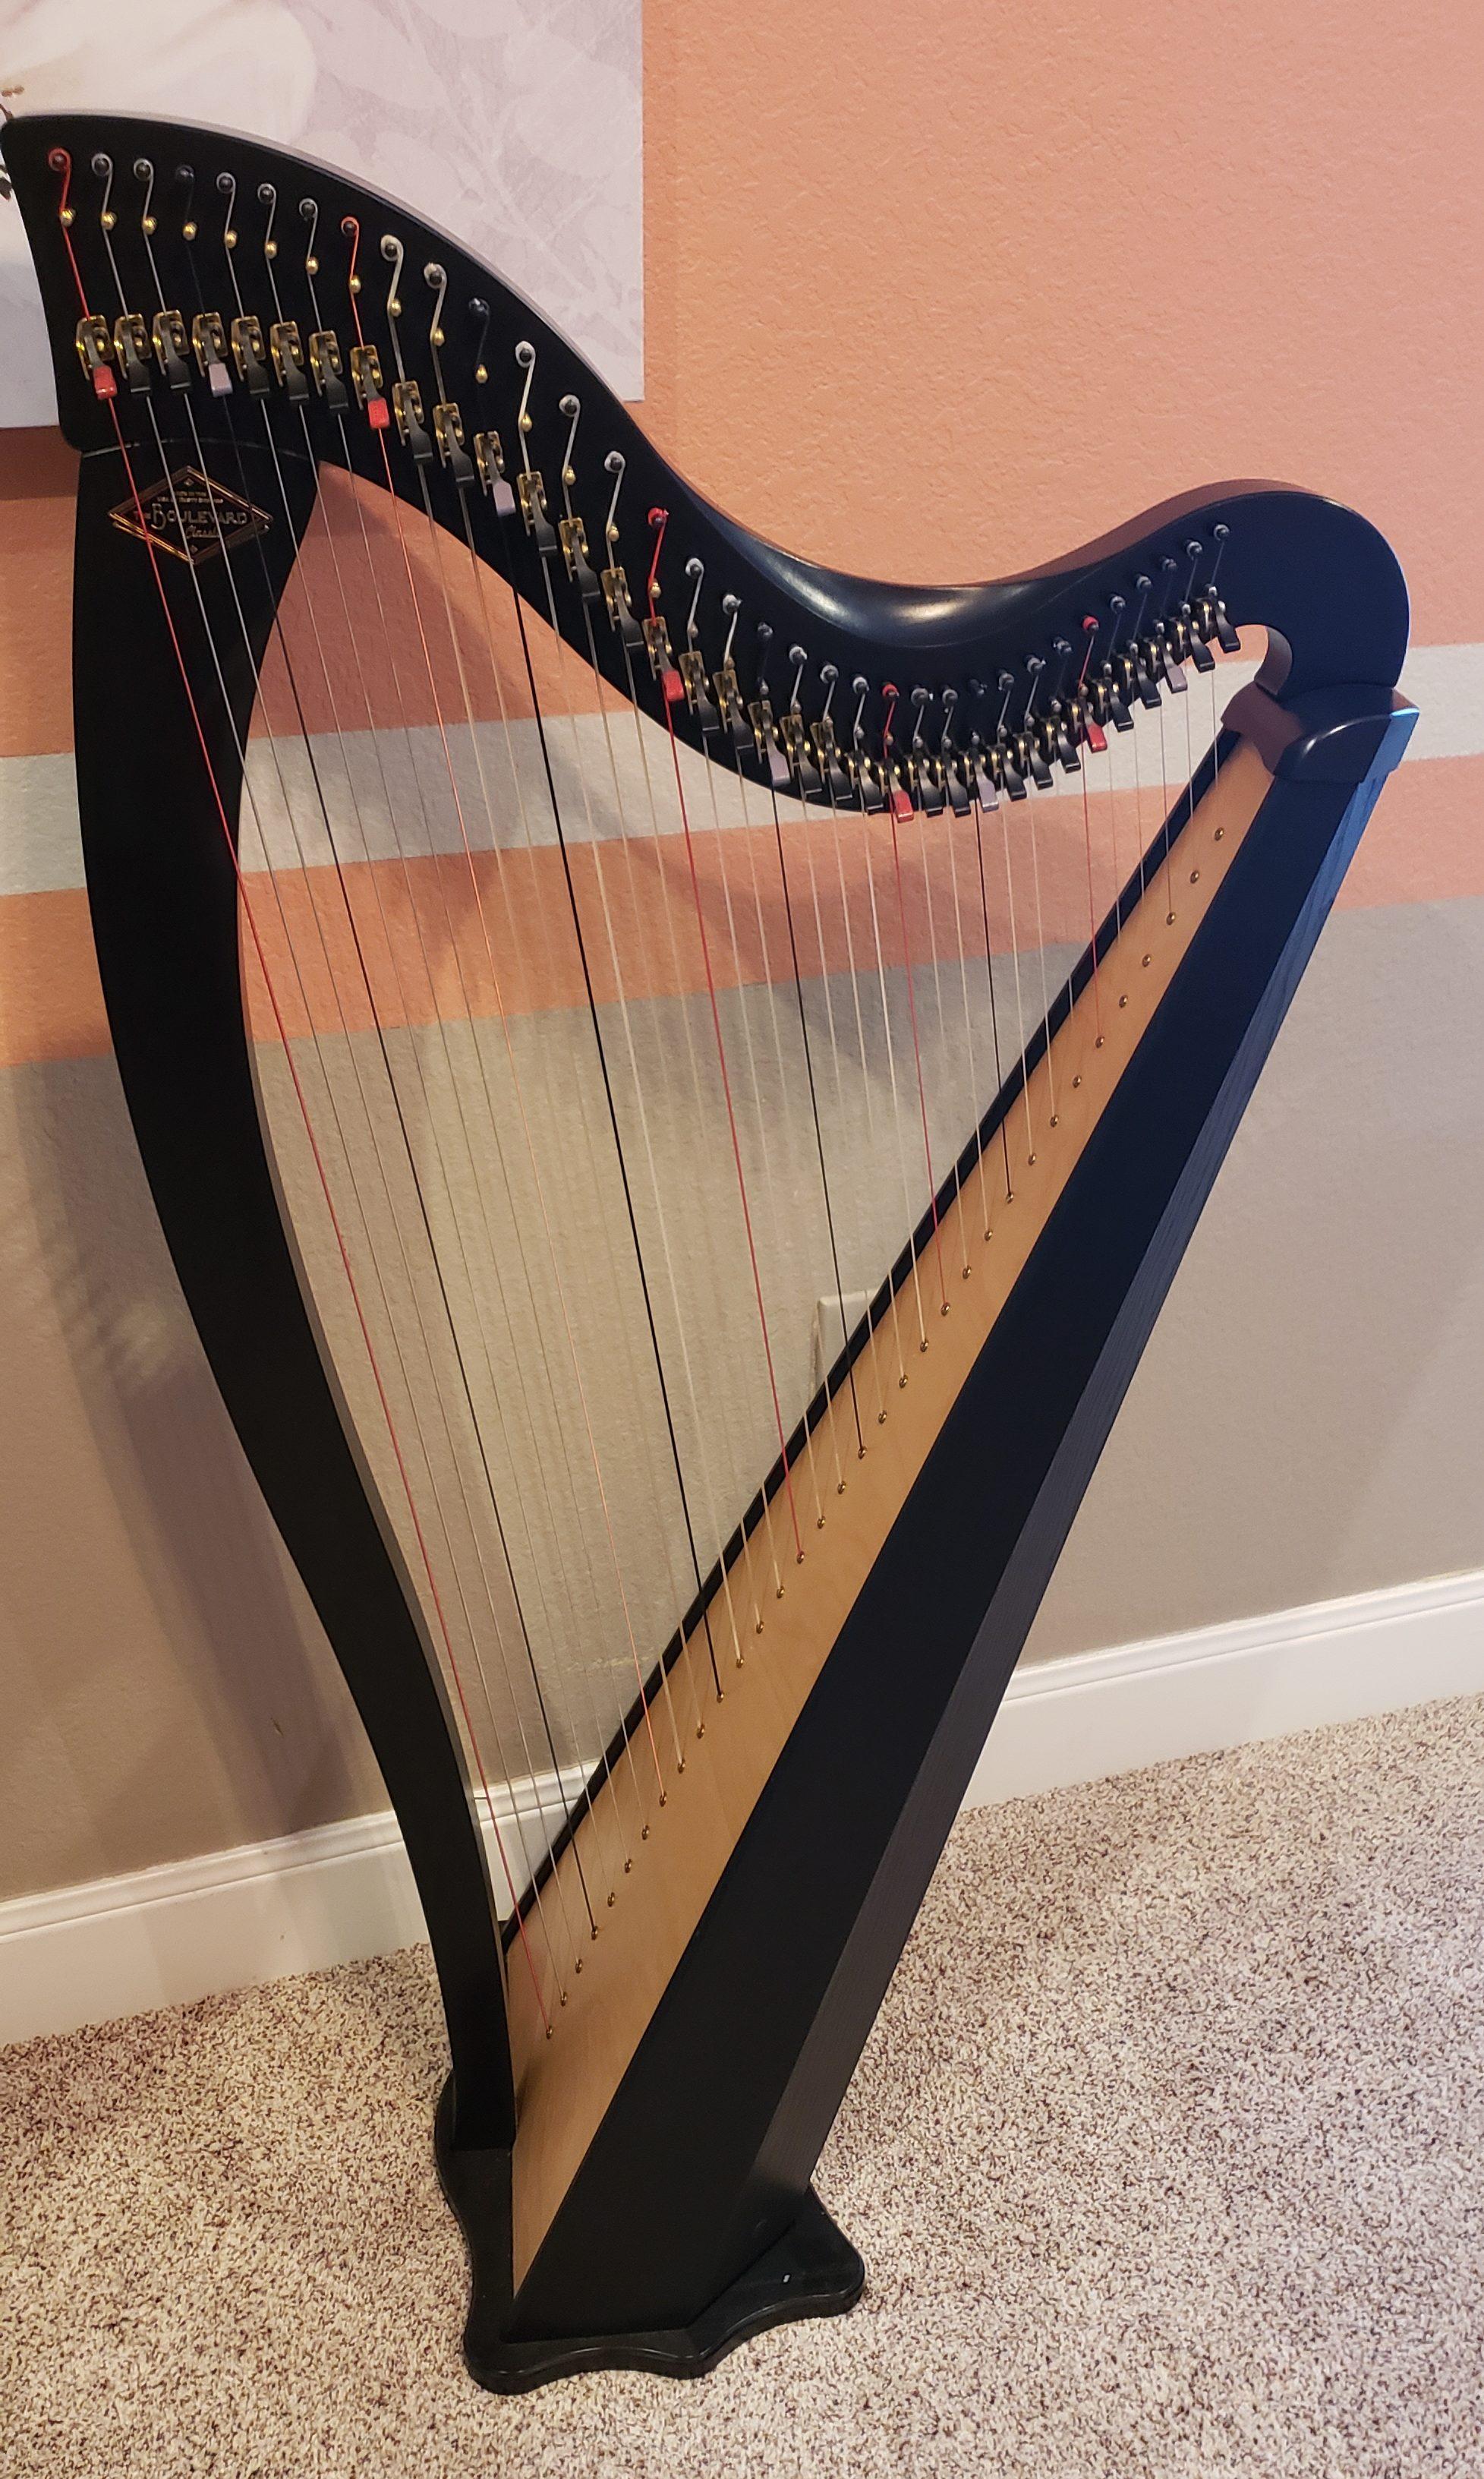 Dusty Strings Boulevard harp for rent